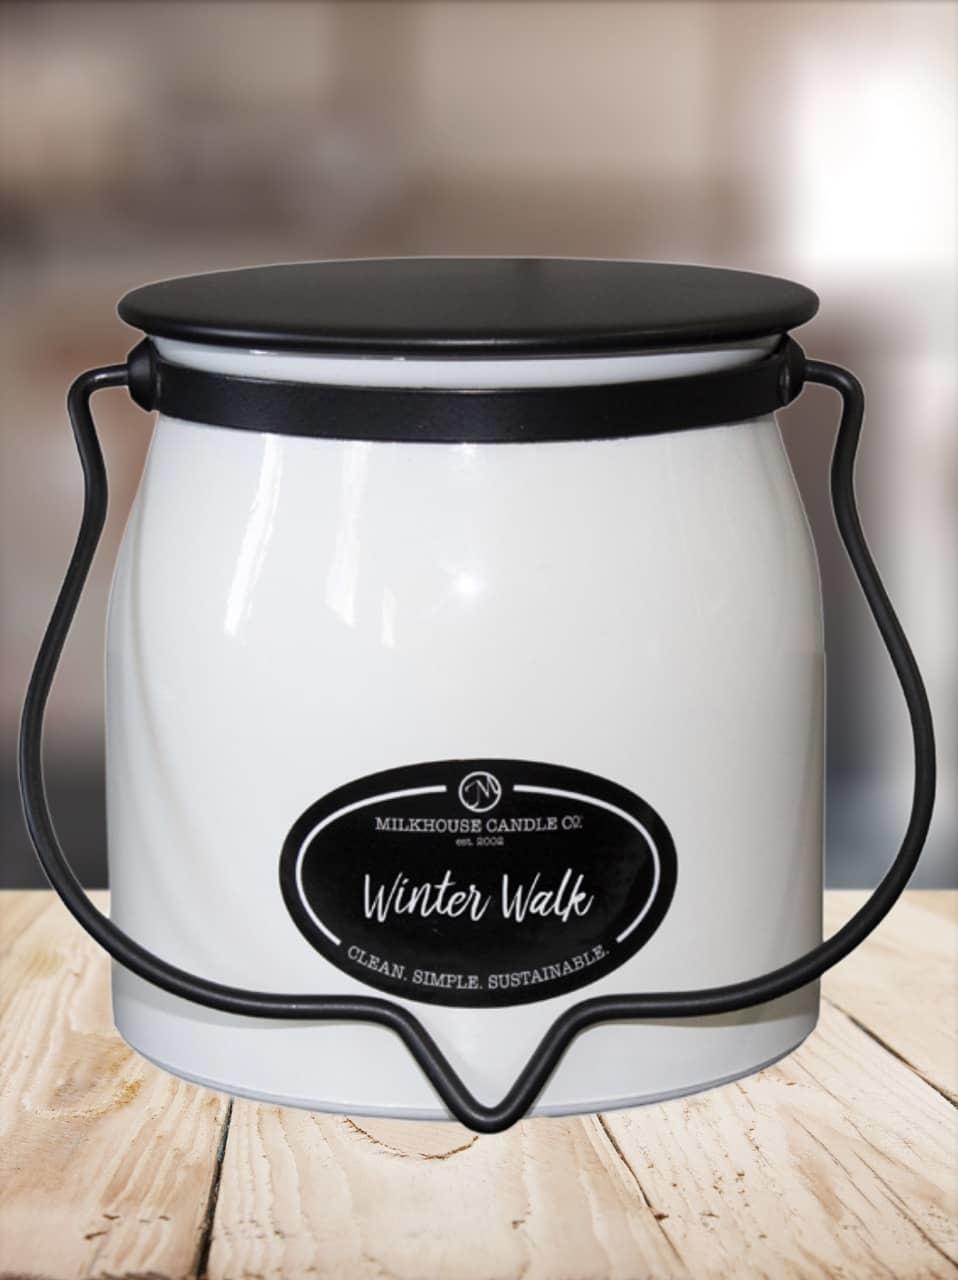 Milkhouse Candles Milkhouse Candle Winter Walk 16oz Butter Jar